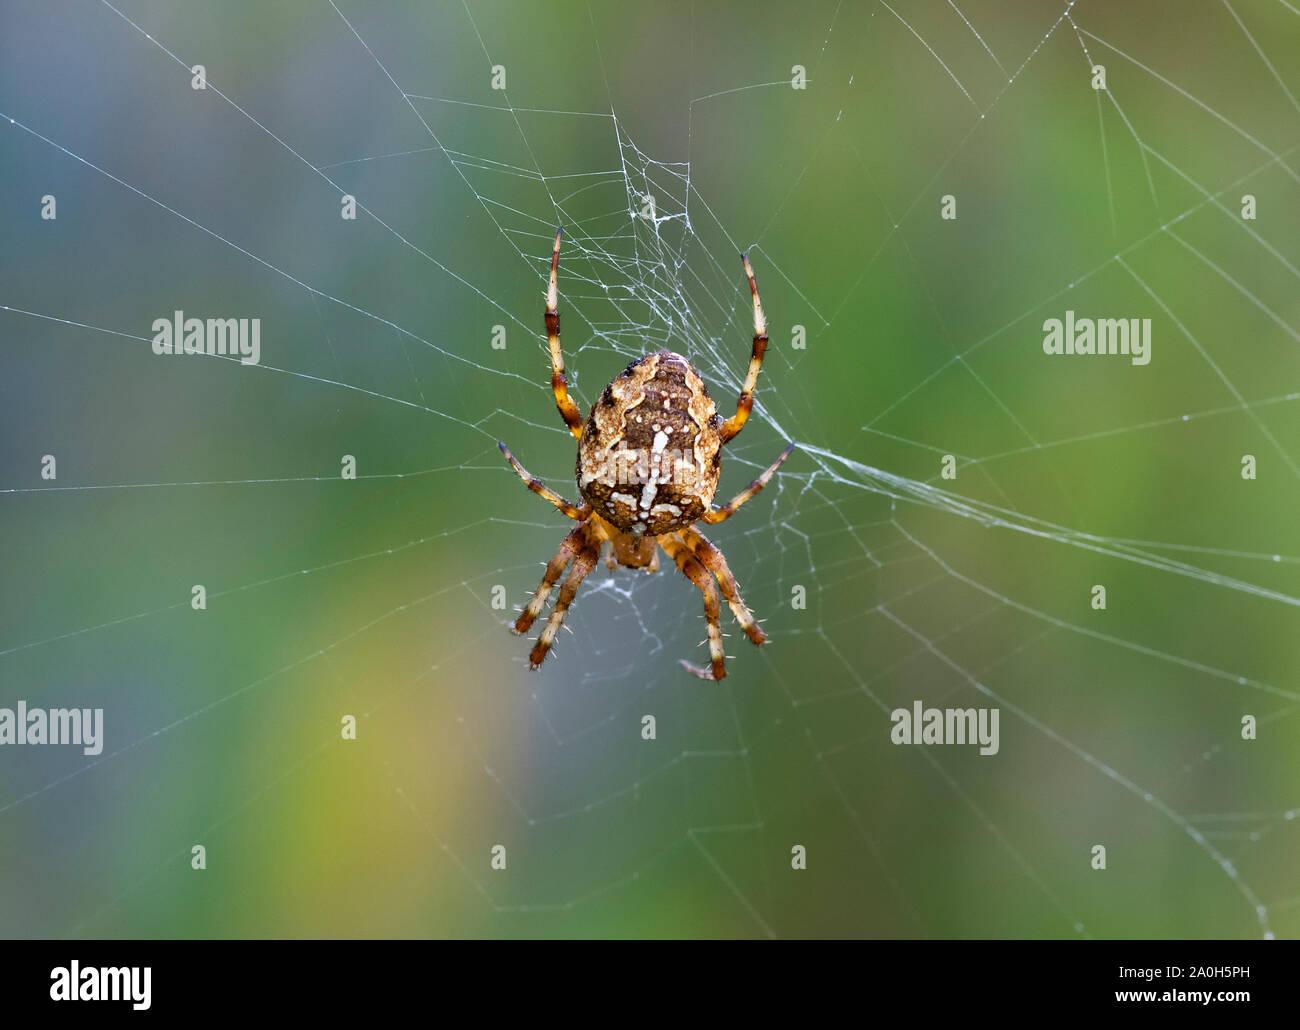 Brightly coloured Garden Cross spider (Araneus diadematus) awaiting prey in the centre of it's web Stock Photo